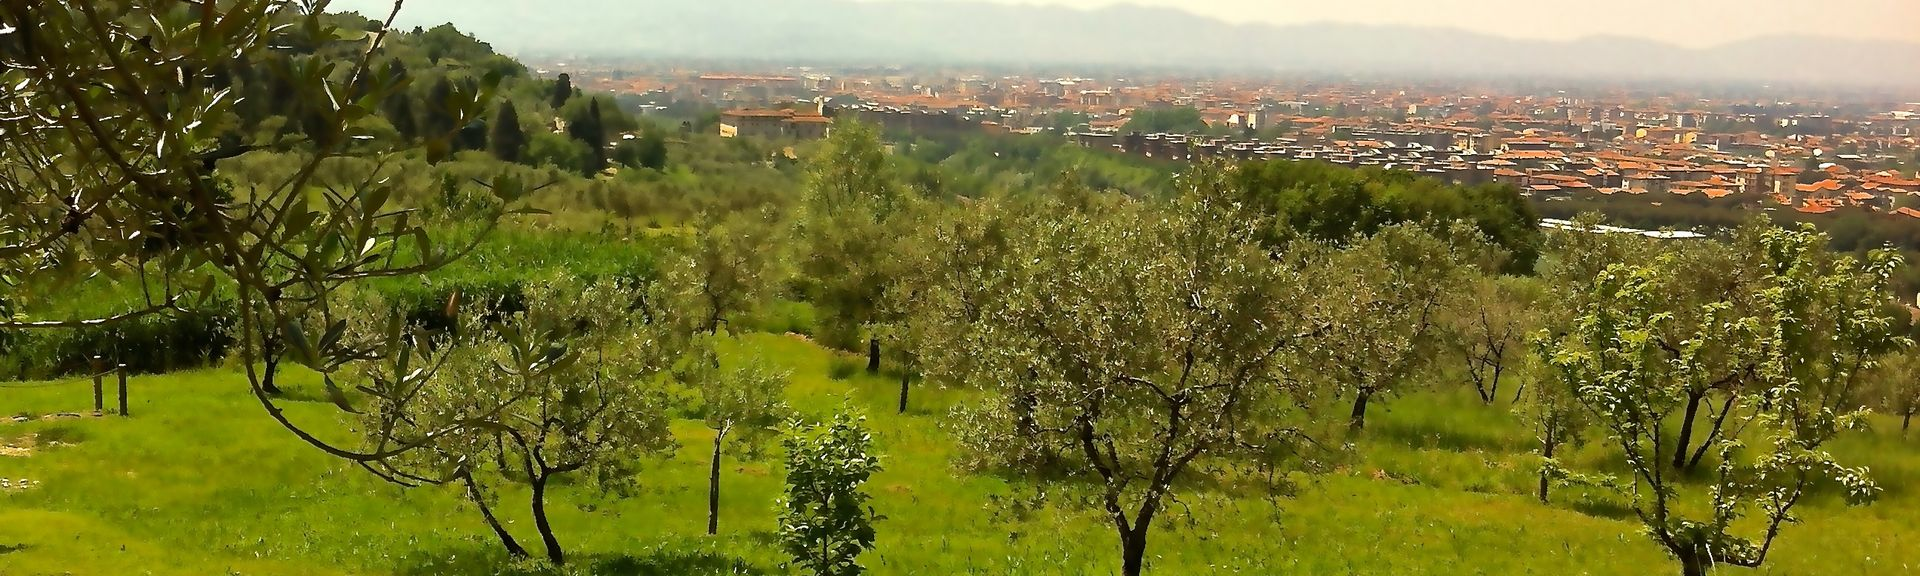 Pistoia, Pistoia, Toscana, Italia